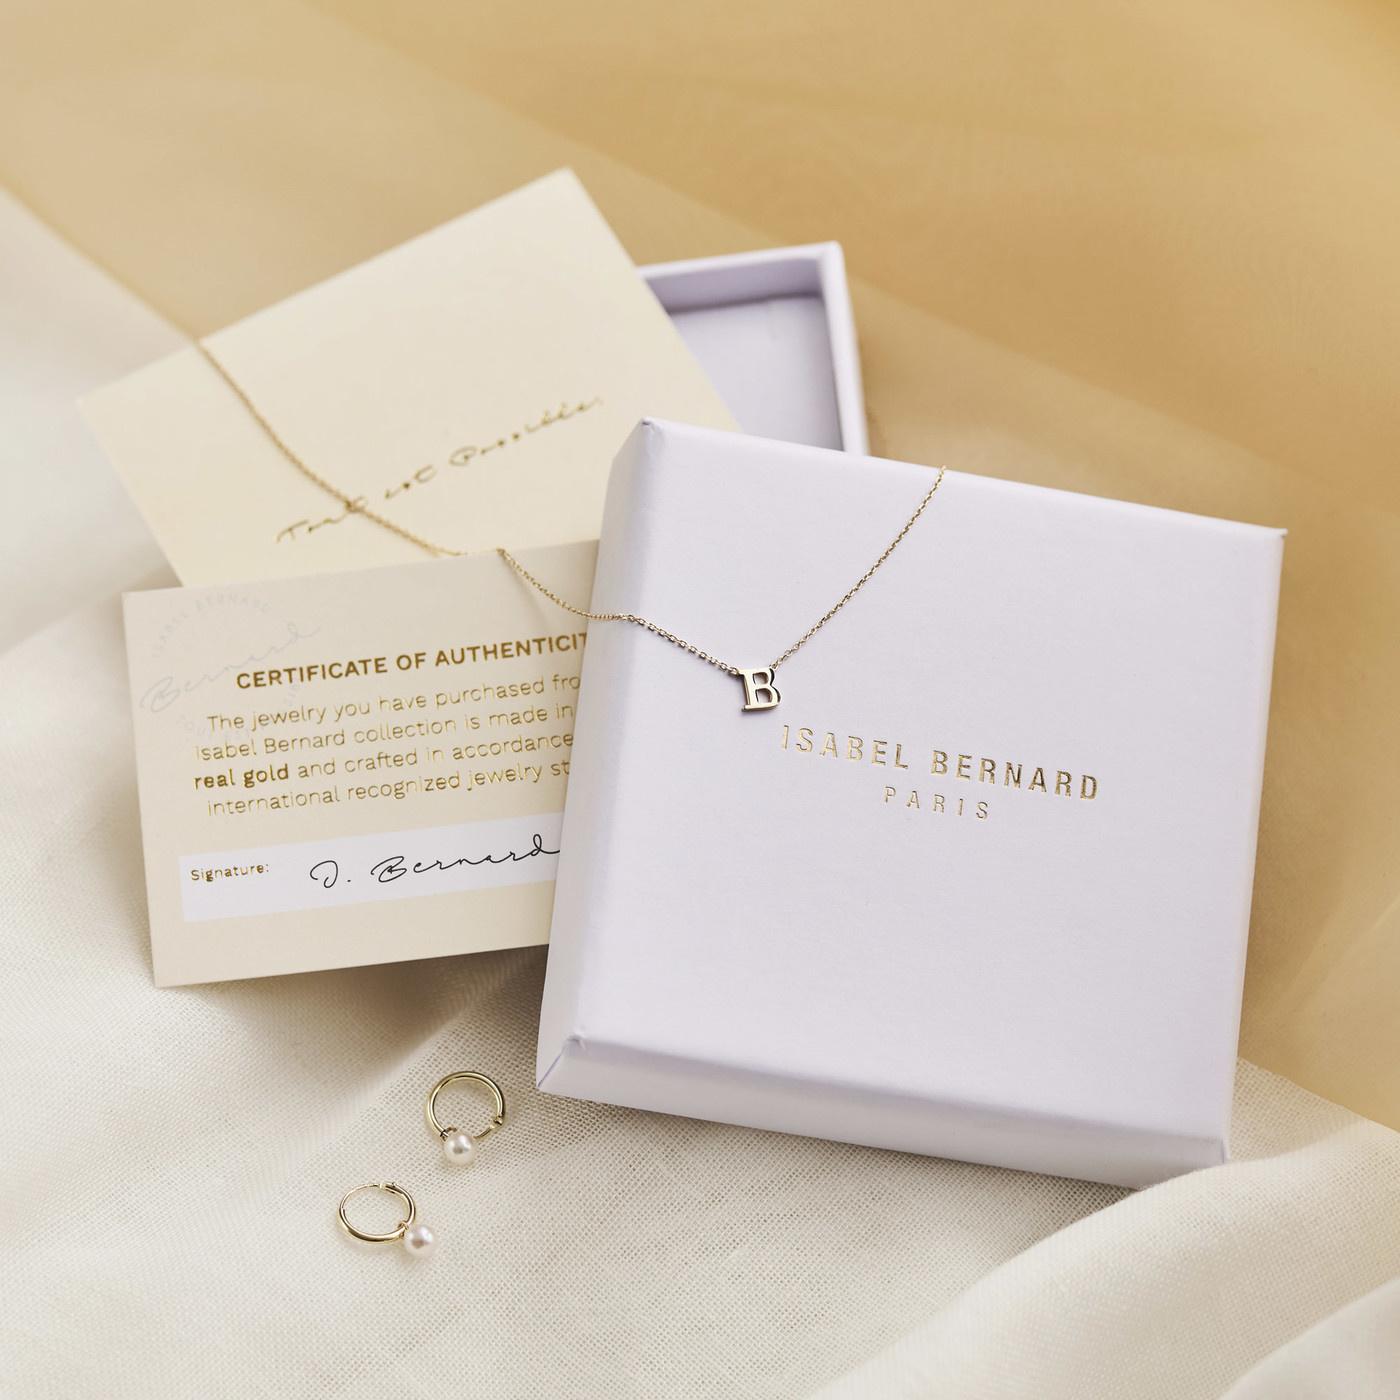 Isabel Bernard Saint Germain Alix 14 karat white gold bracelet with heart